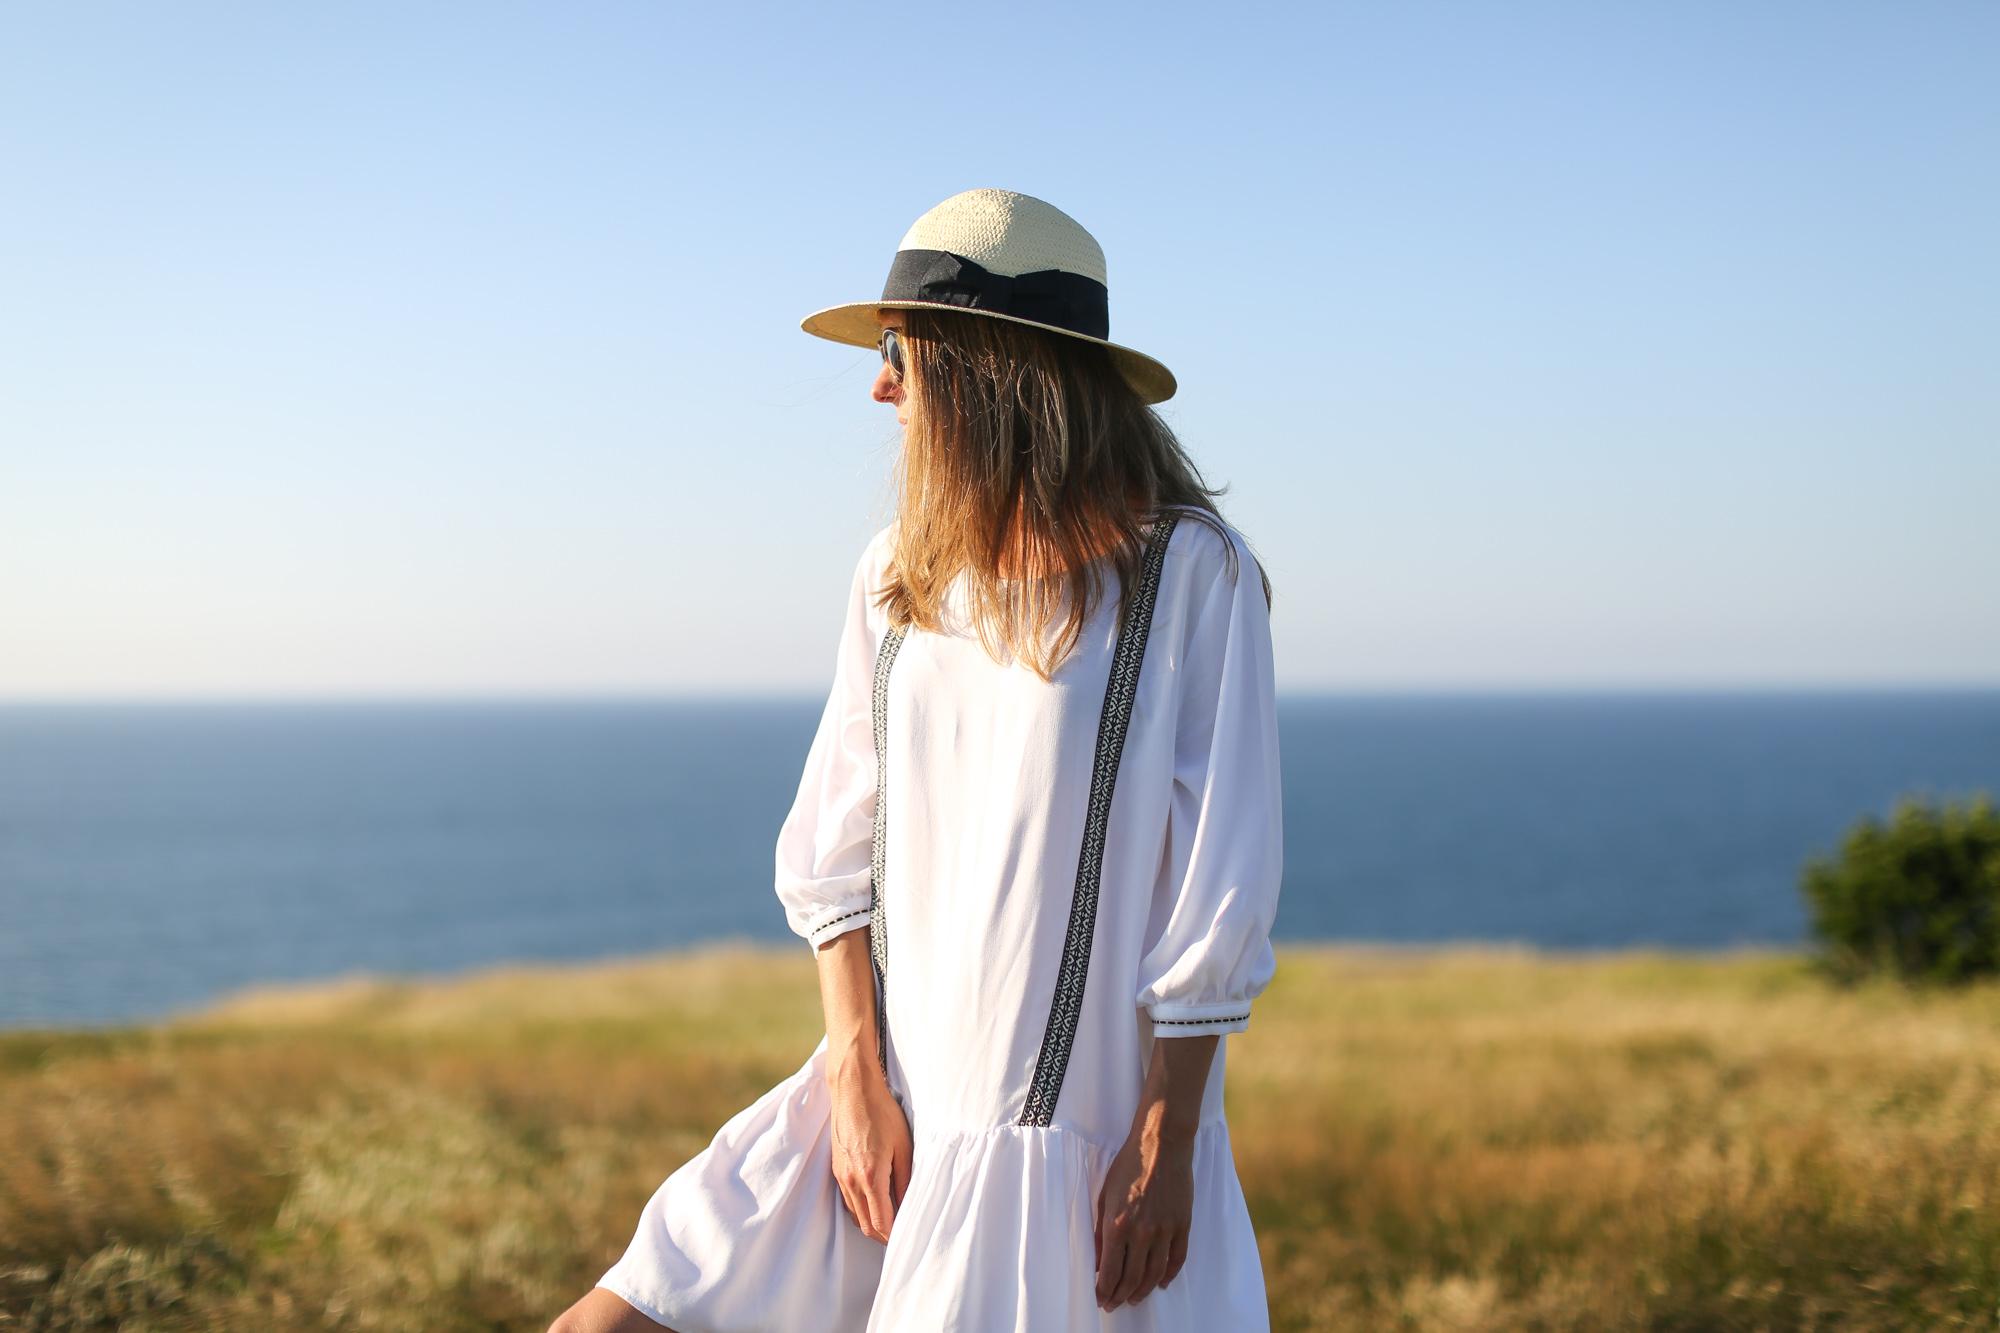 Clochet_streetstyle_olive_clothing_boho_dress_straw_hat-7